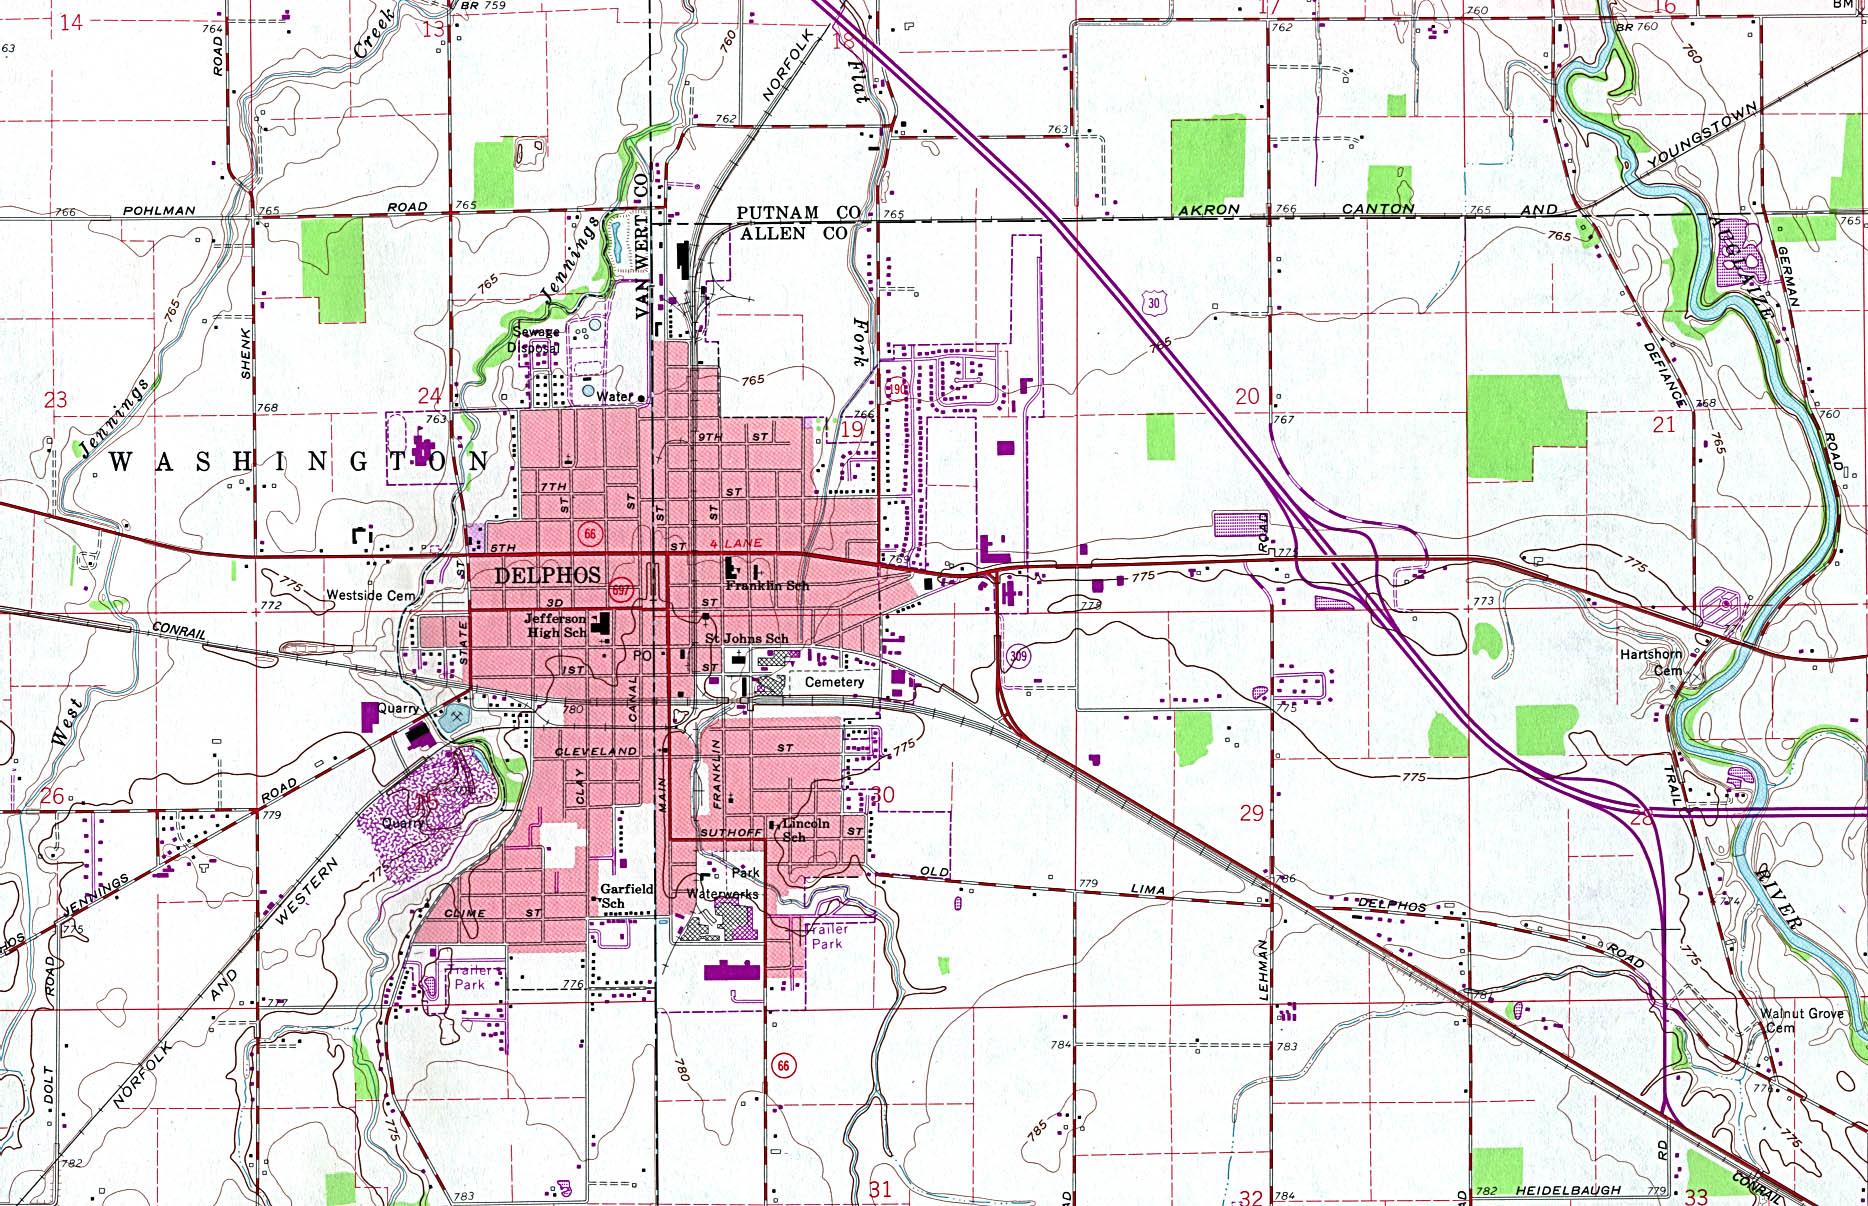 Reisenett: Ohio Maps